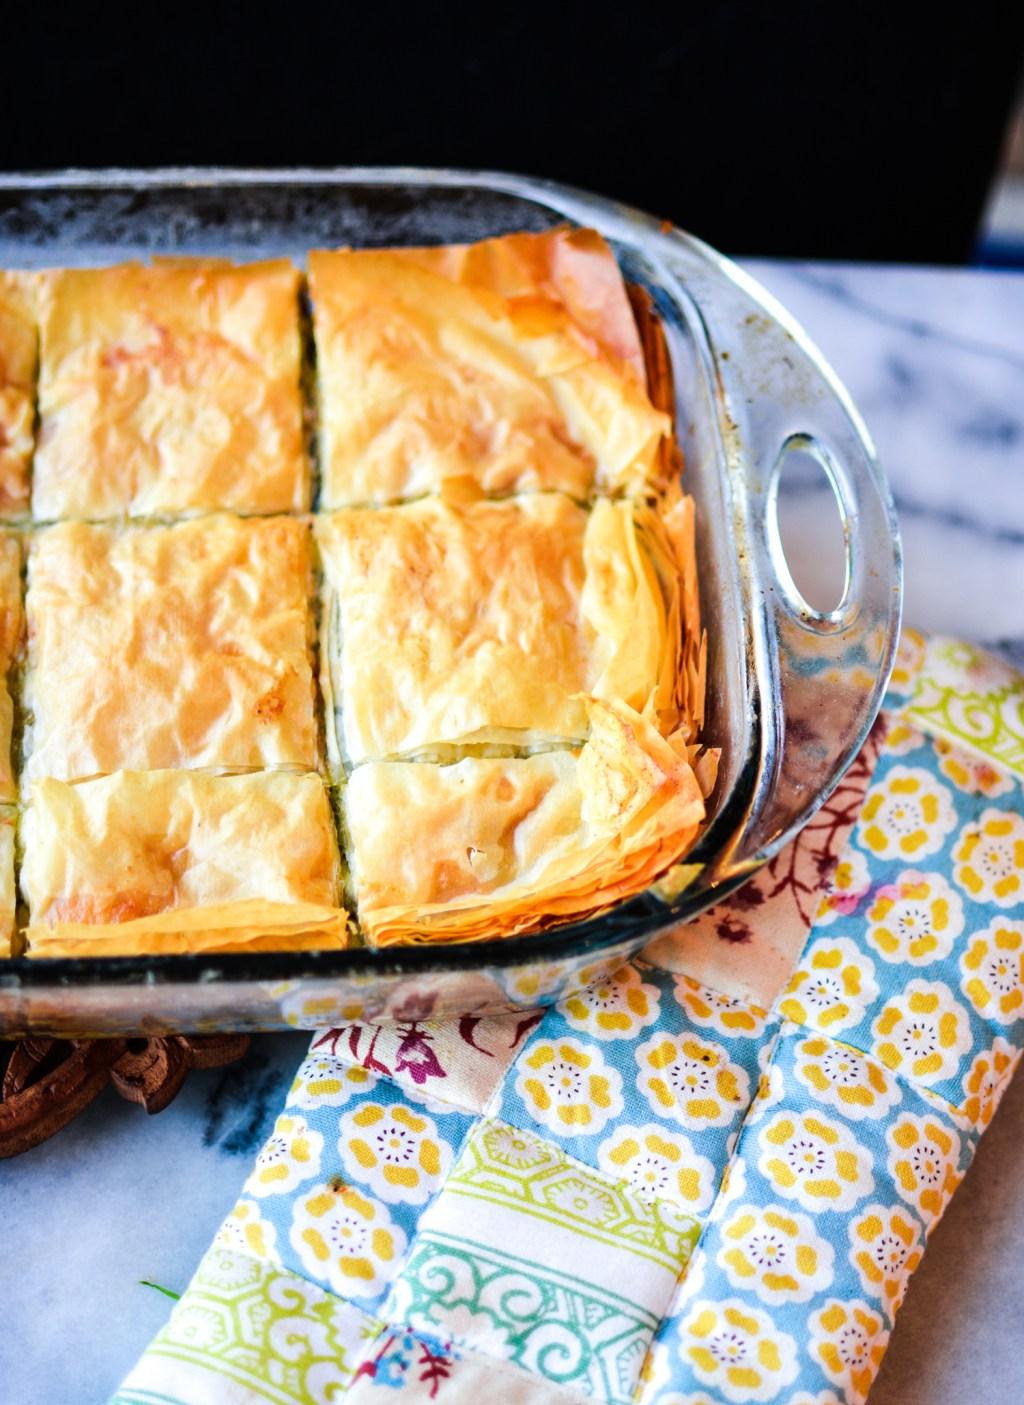 Best Homemade Spanakopita Recipe - Greek - @lacegraceblog1